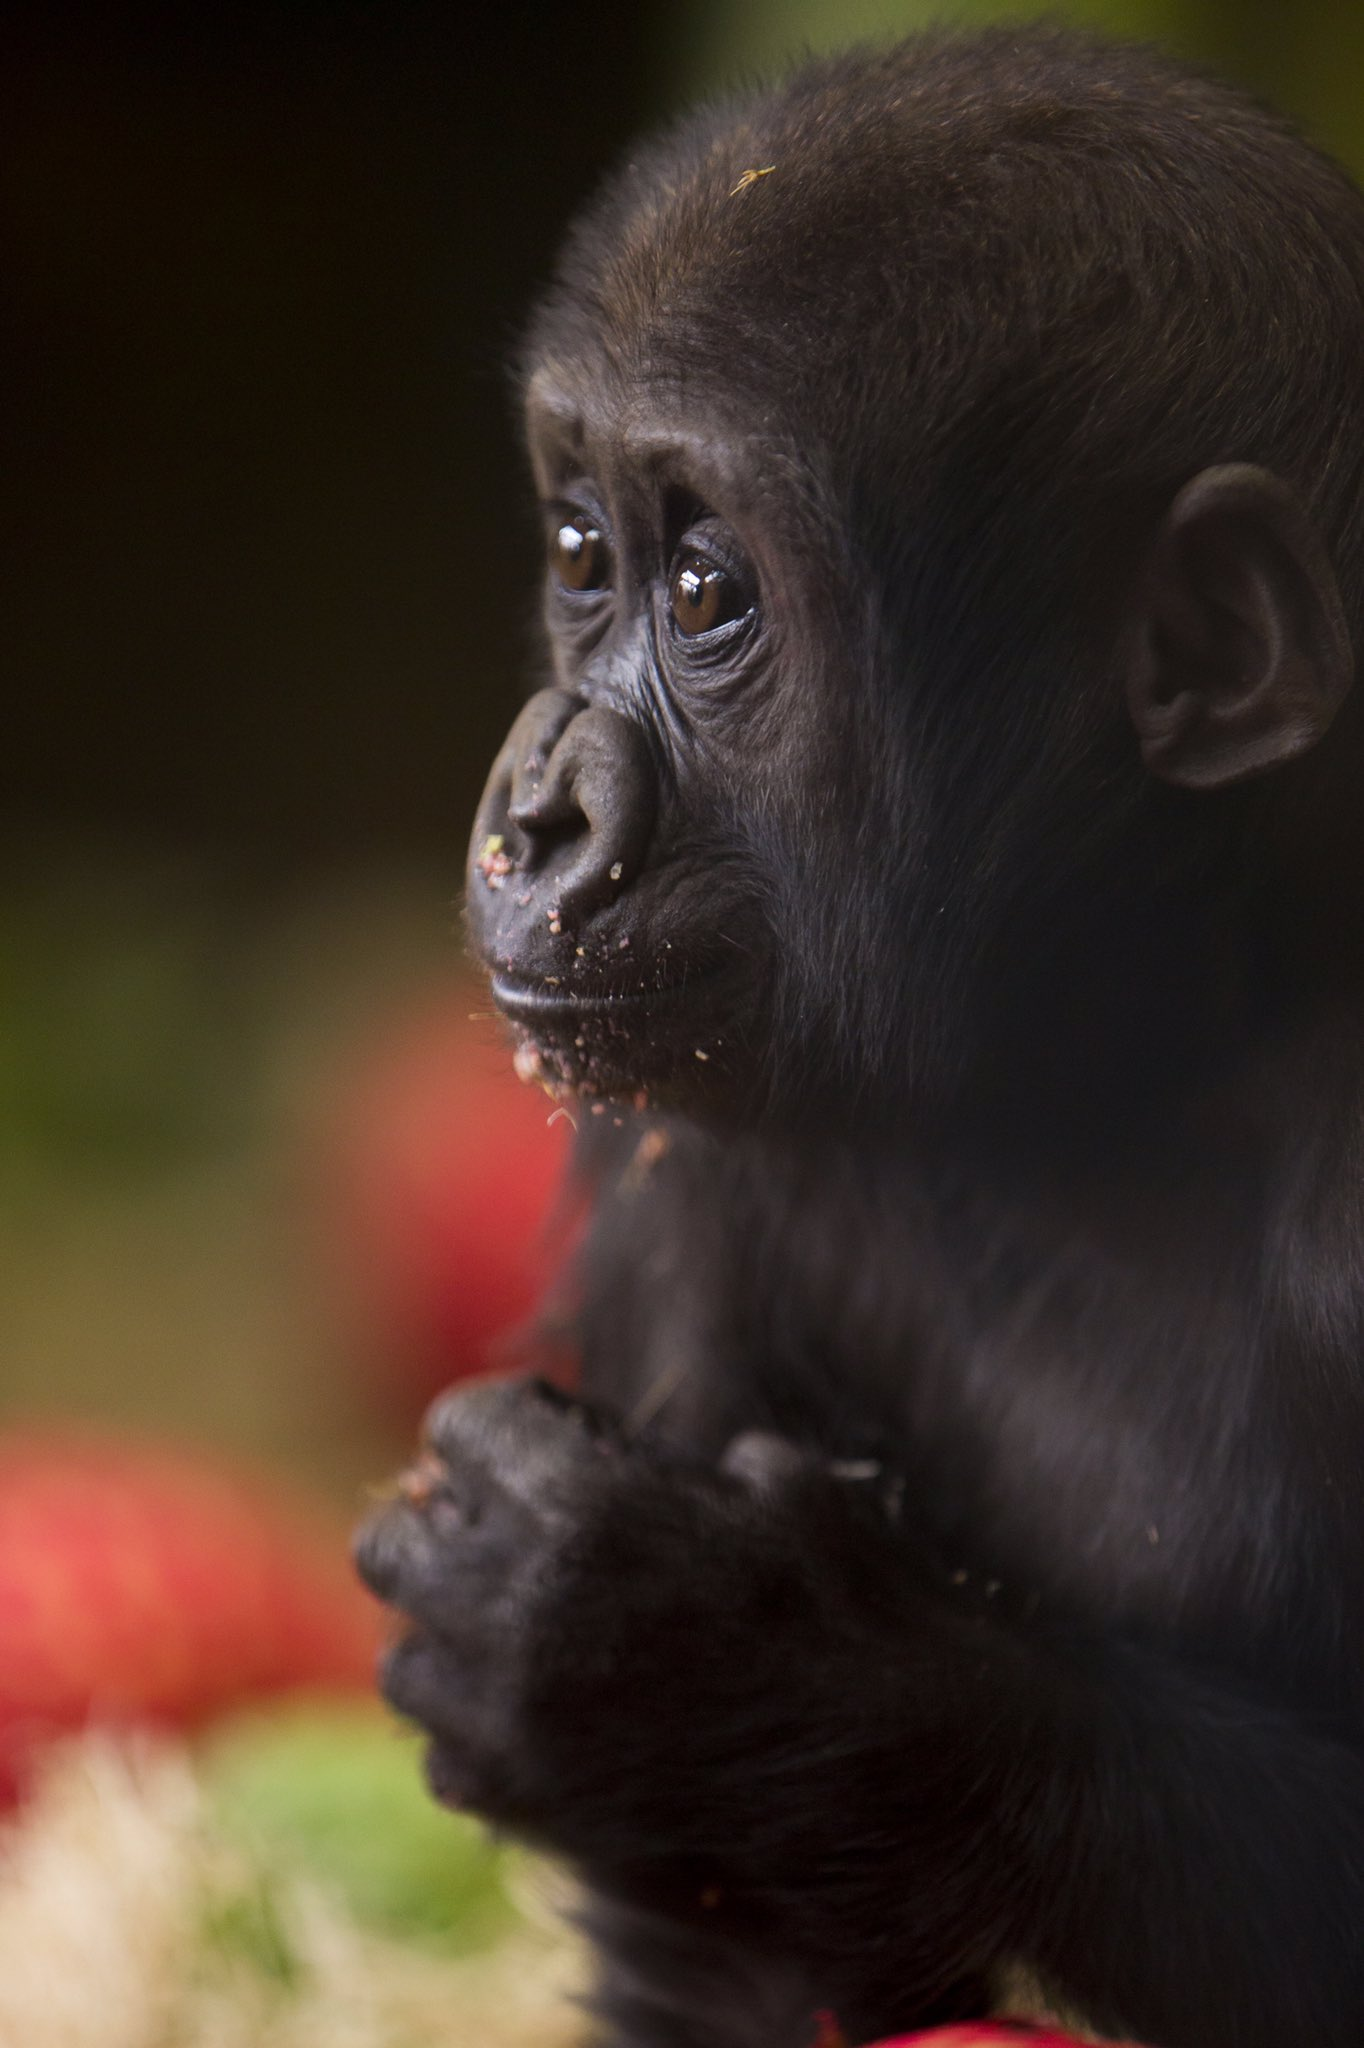 .@MemphisZoo we raise you a #CuteAnimalTweetOff of an endangered lowland gorilla infant enjoying some snacks. https://t.co/YzwpbXHXvP